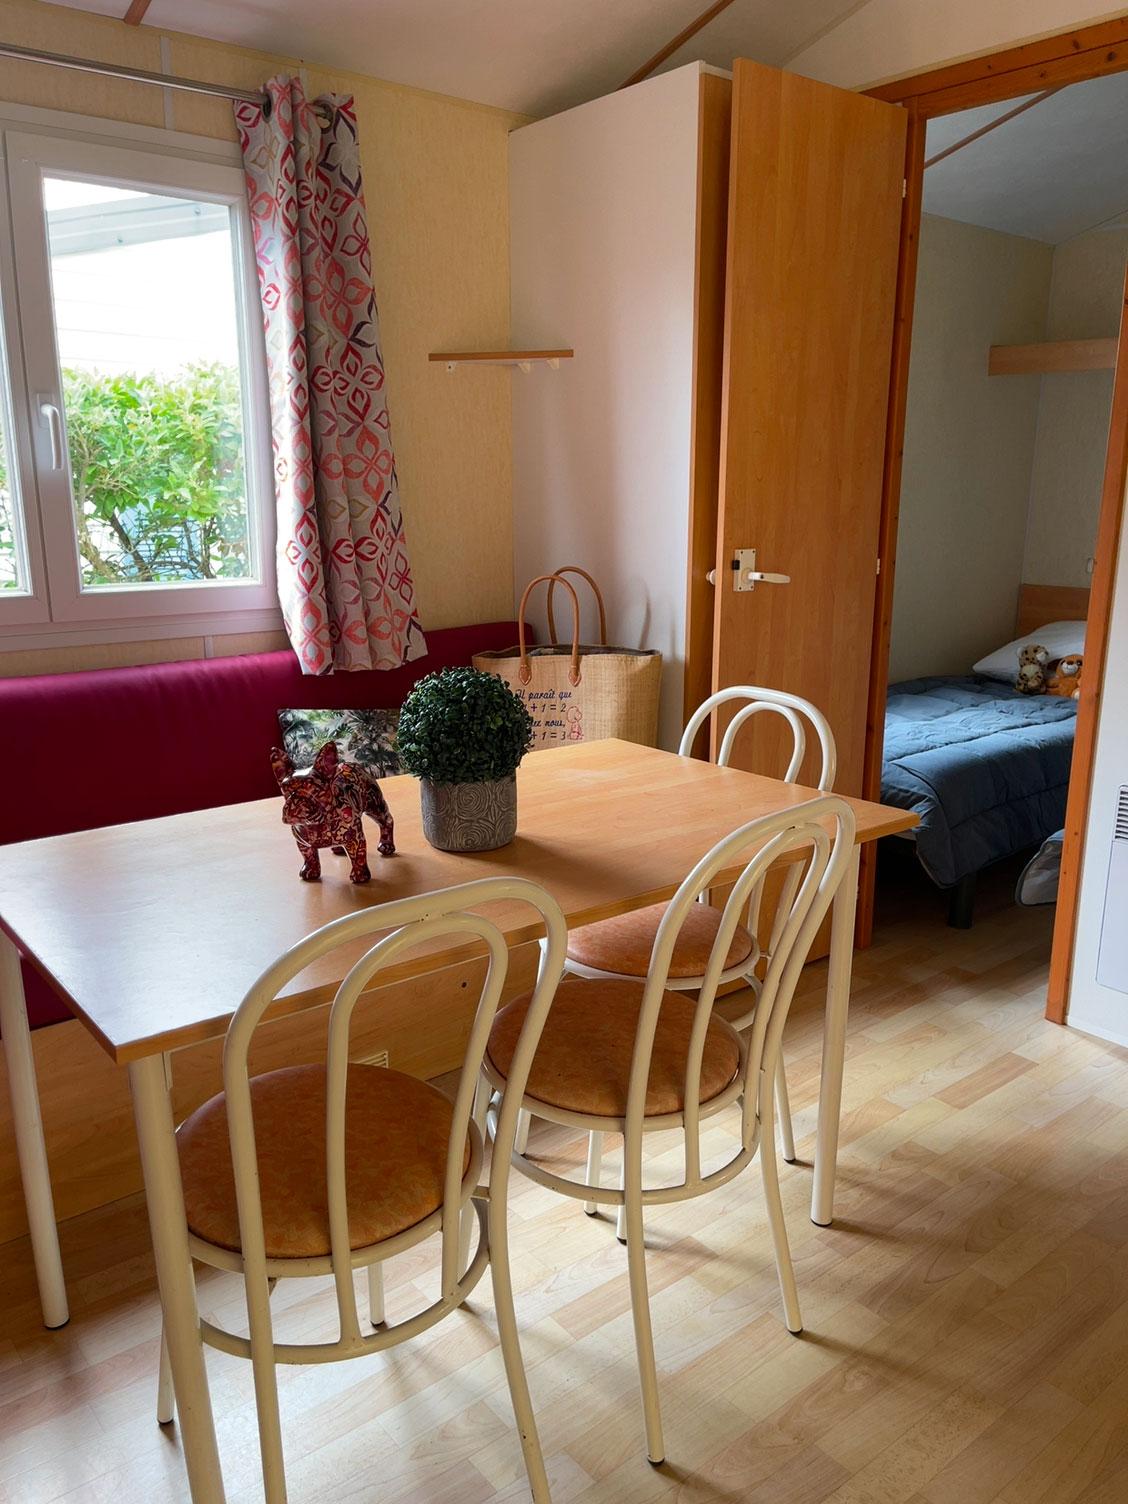 galerie-location-mobil-home-6-8-personnes-evasion-salon-camping-moricq